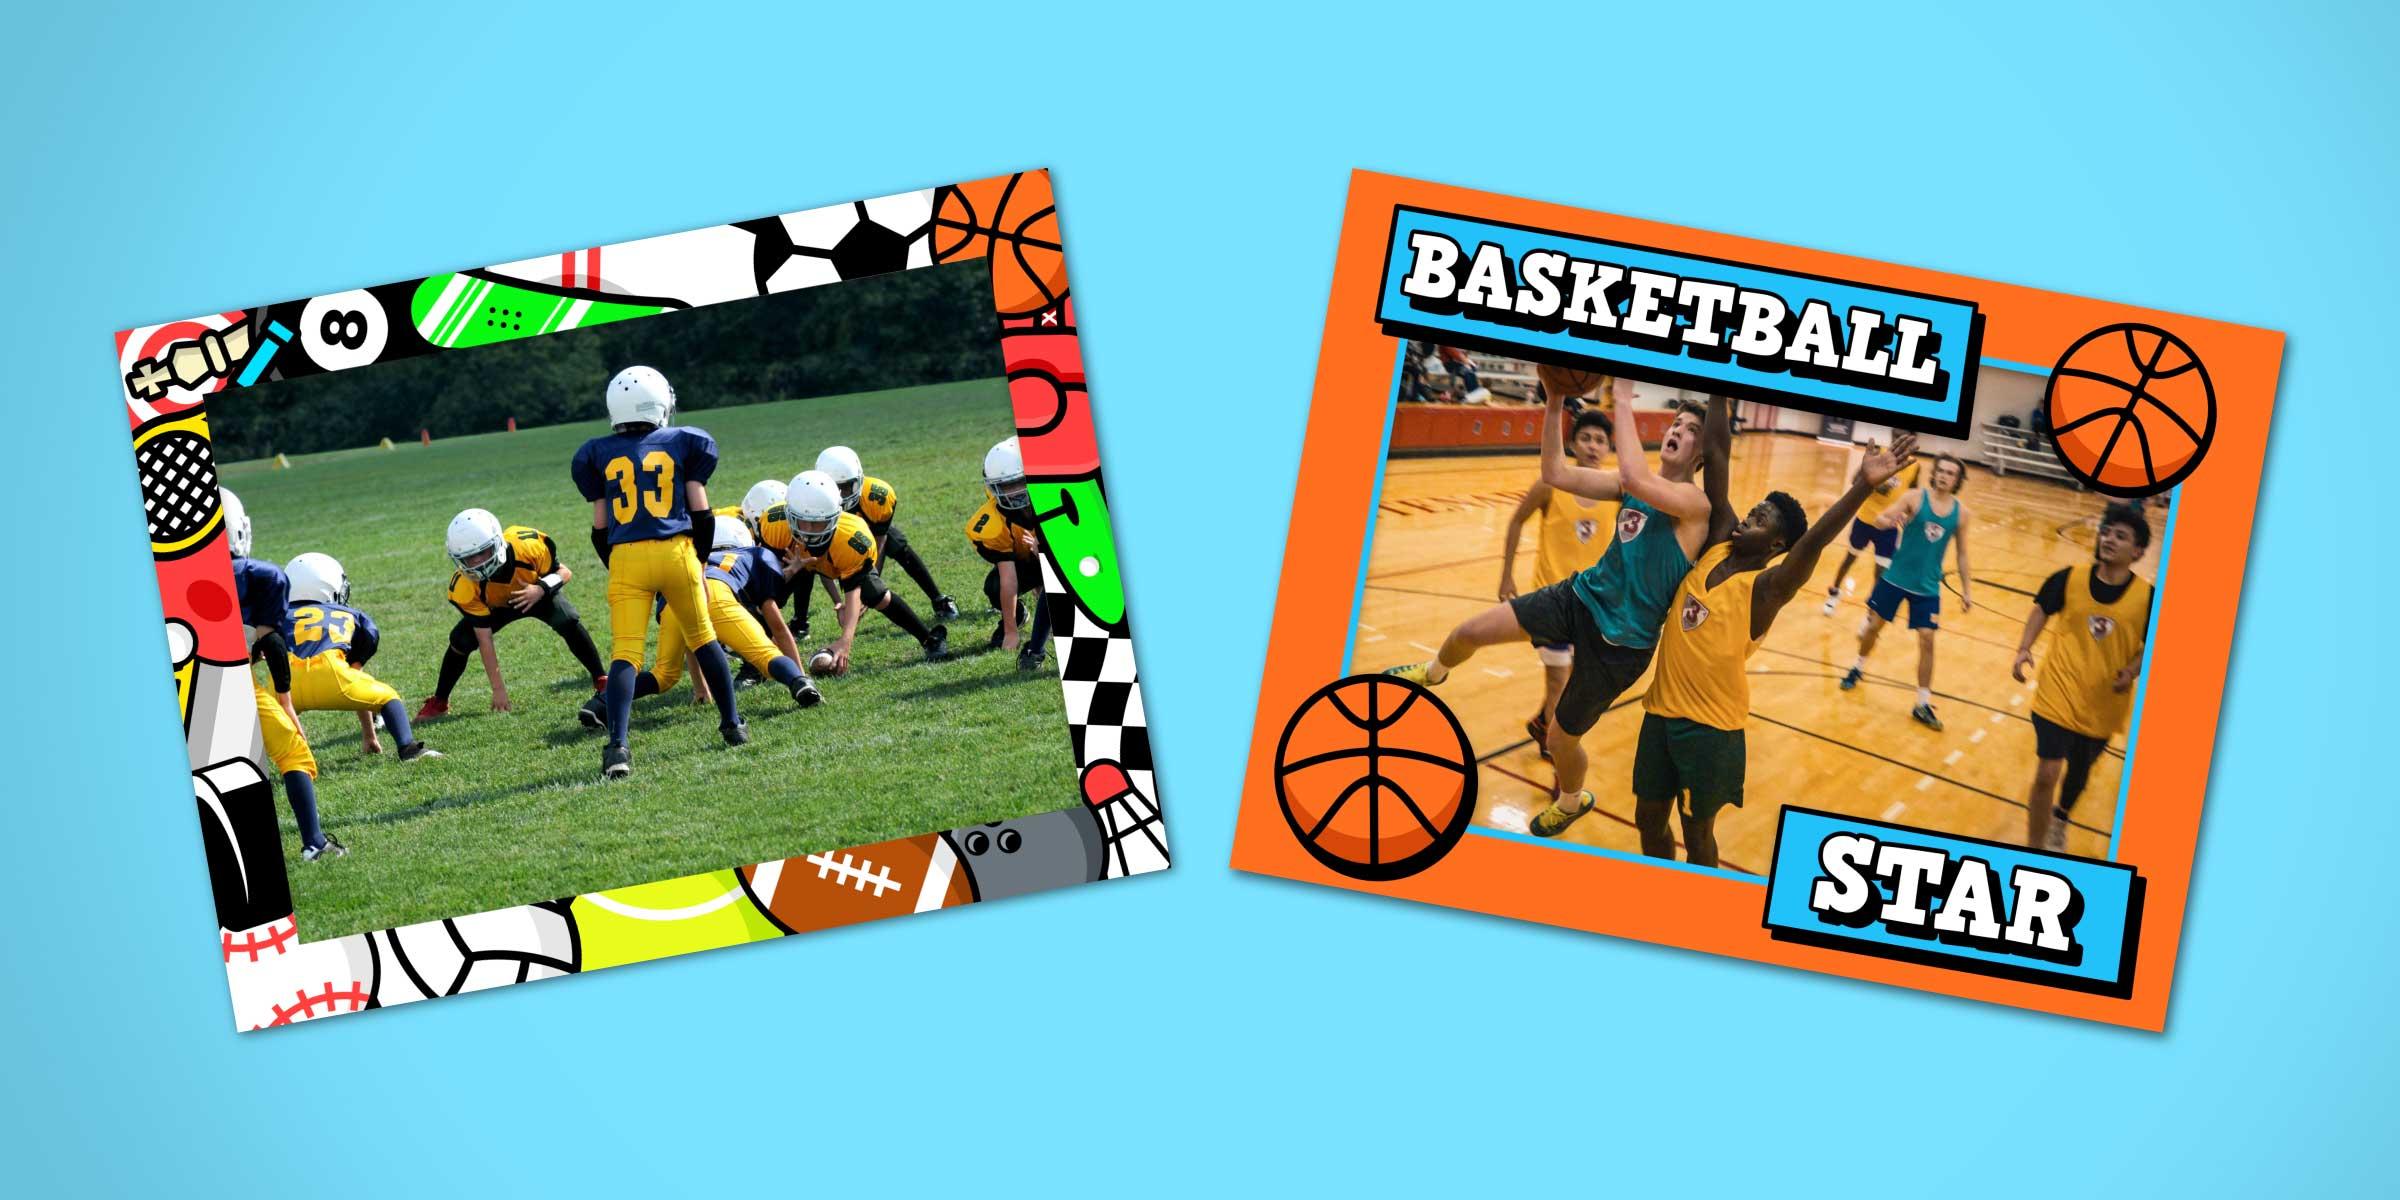 Sports frames for Mac in ImageFramer